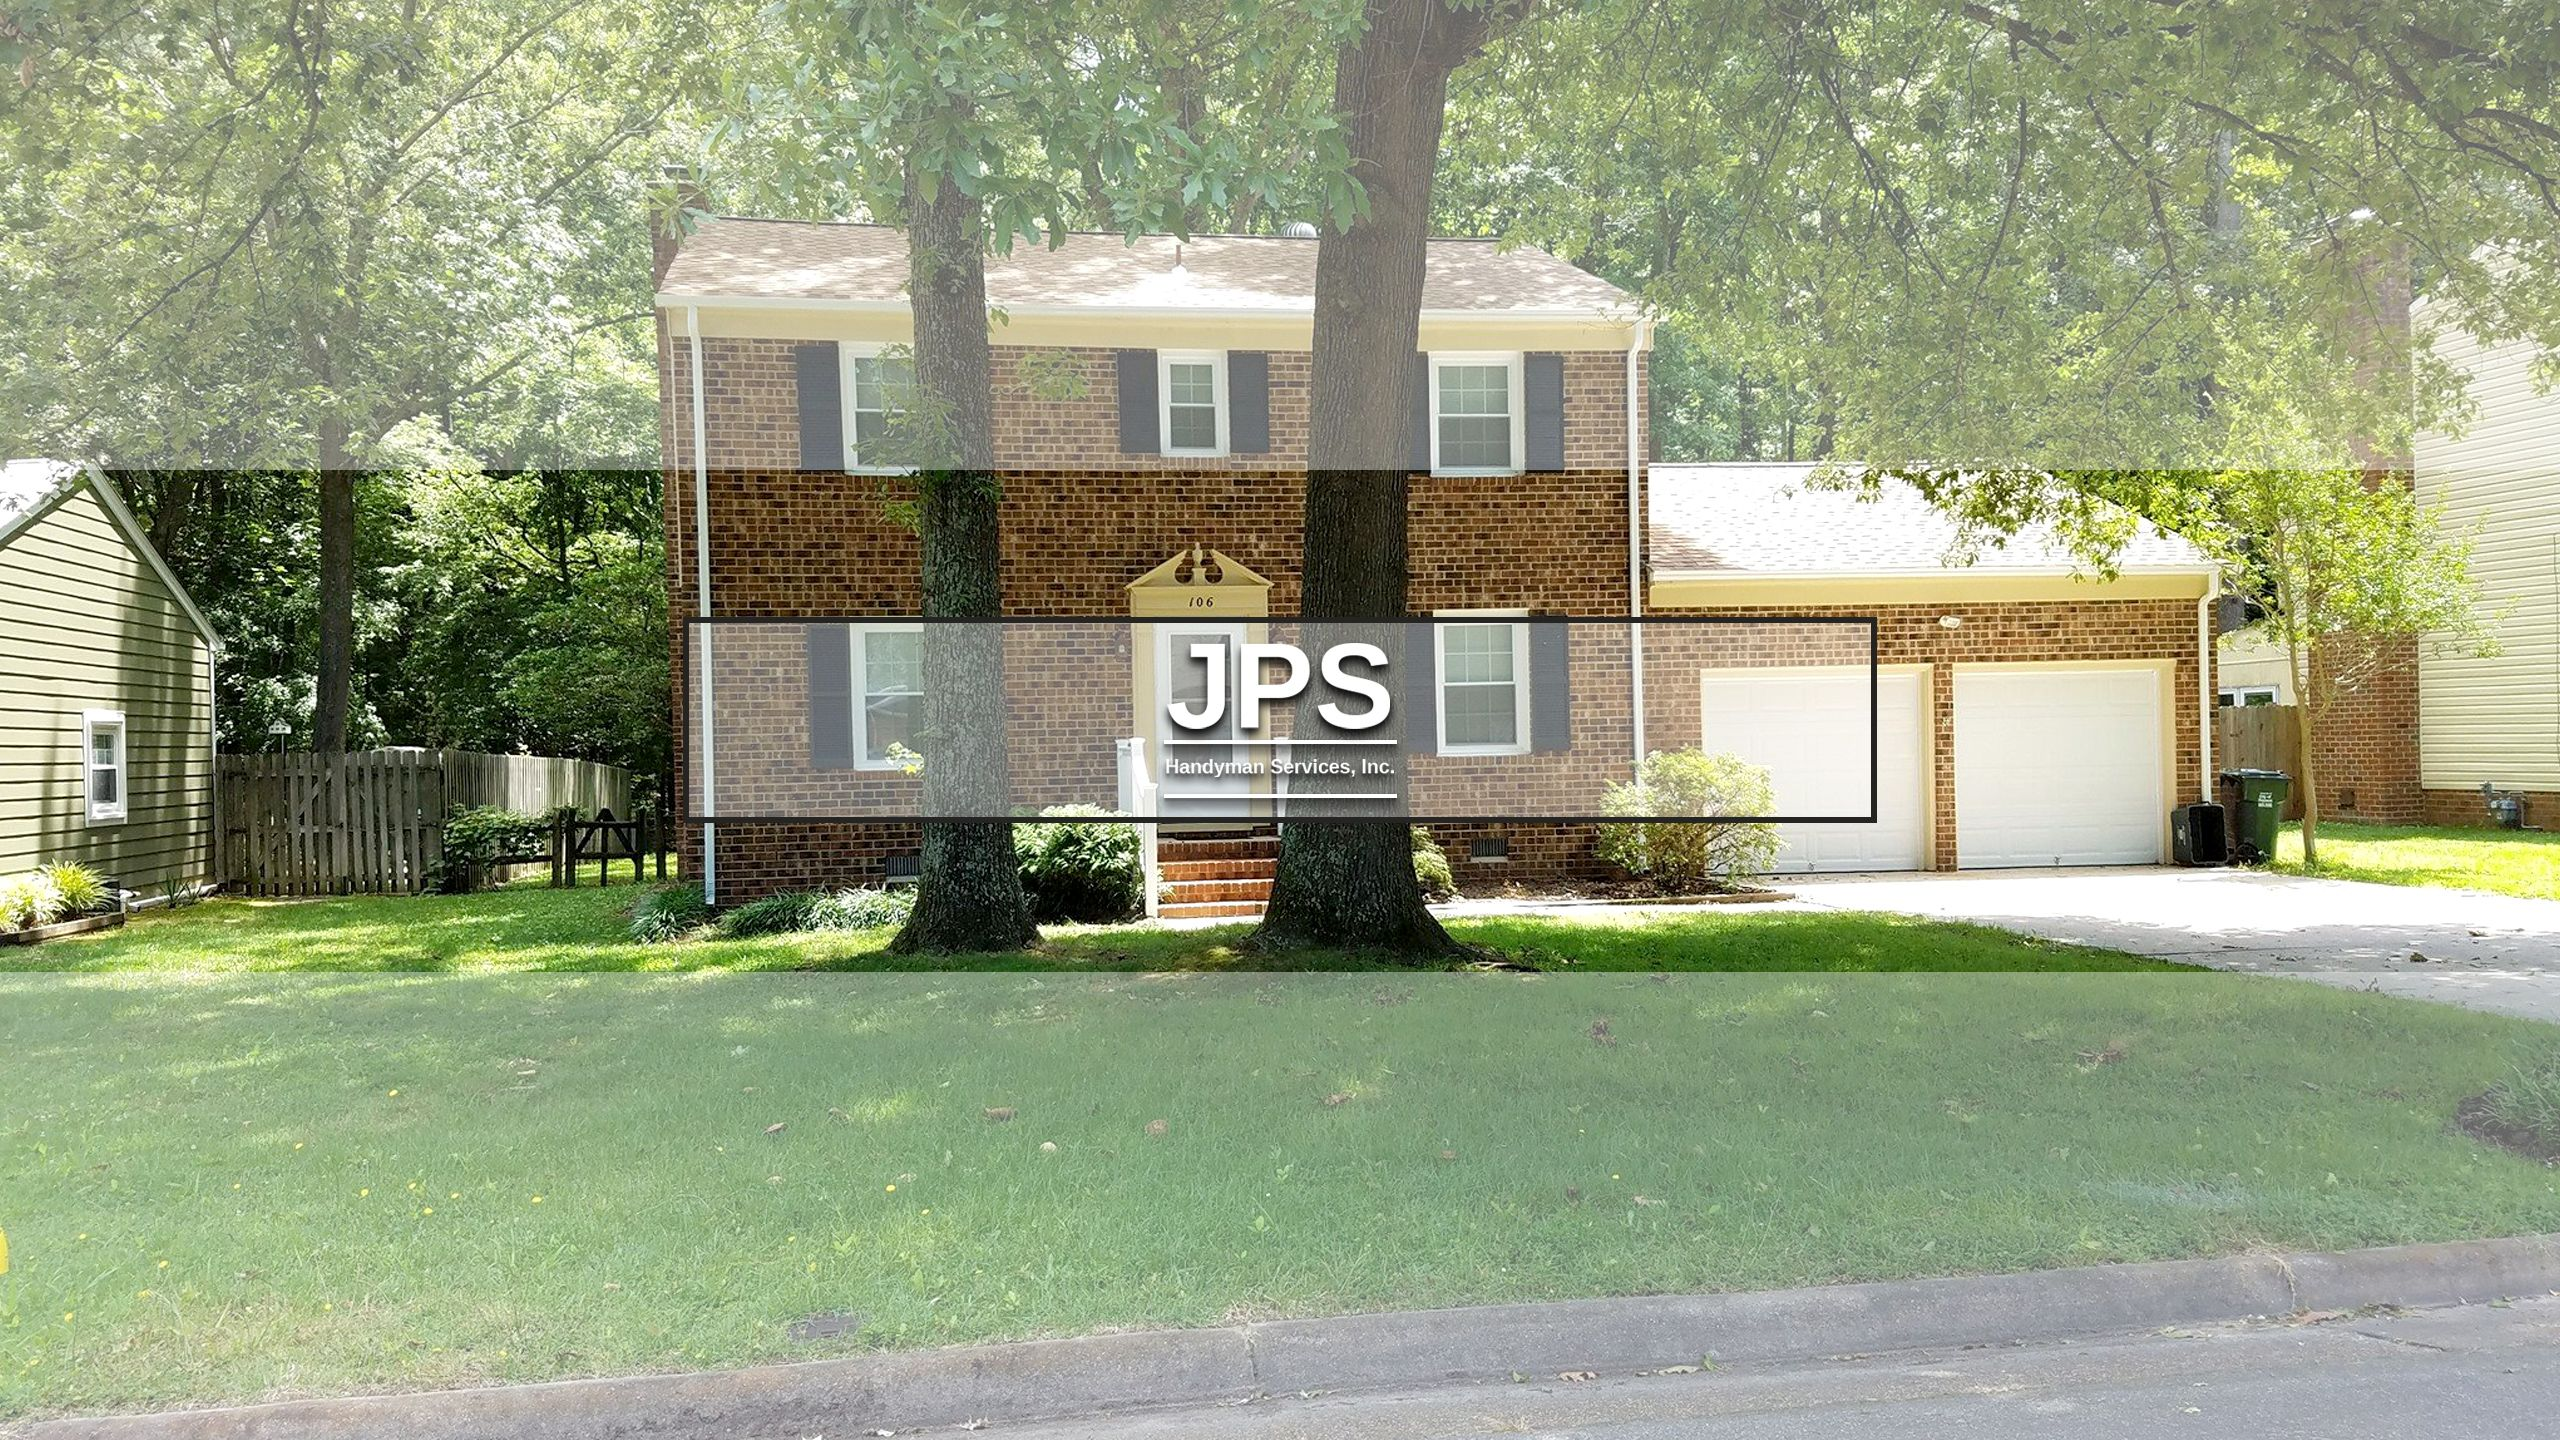 JPS Handyman Services, Inc Is A General Contractor In Newport News, VA. We